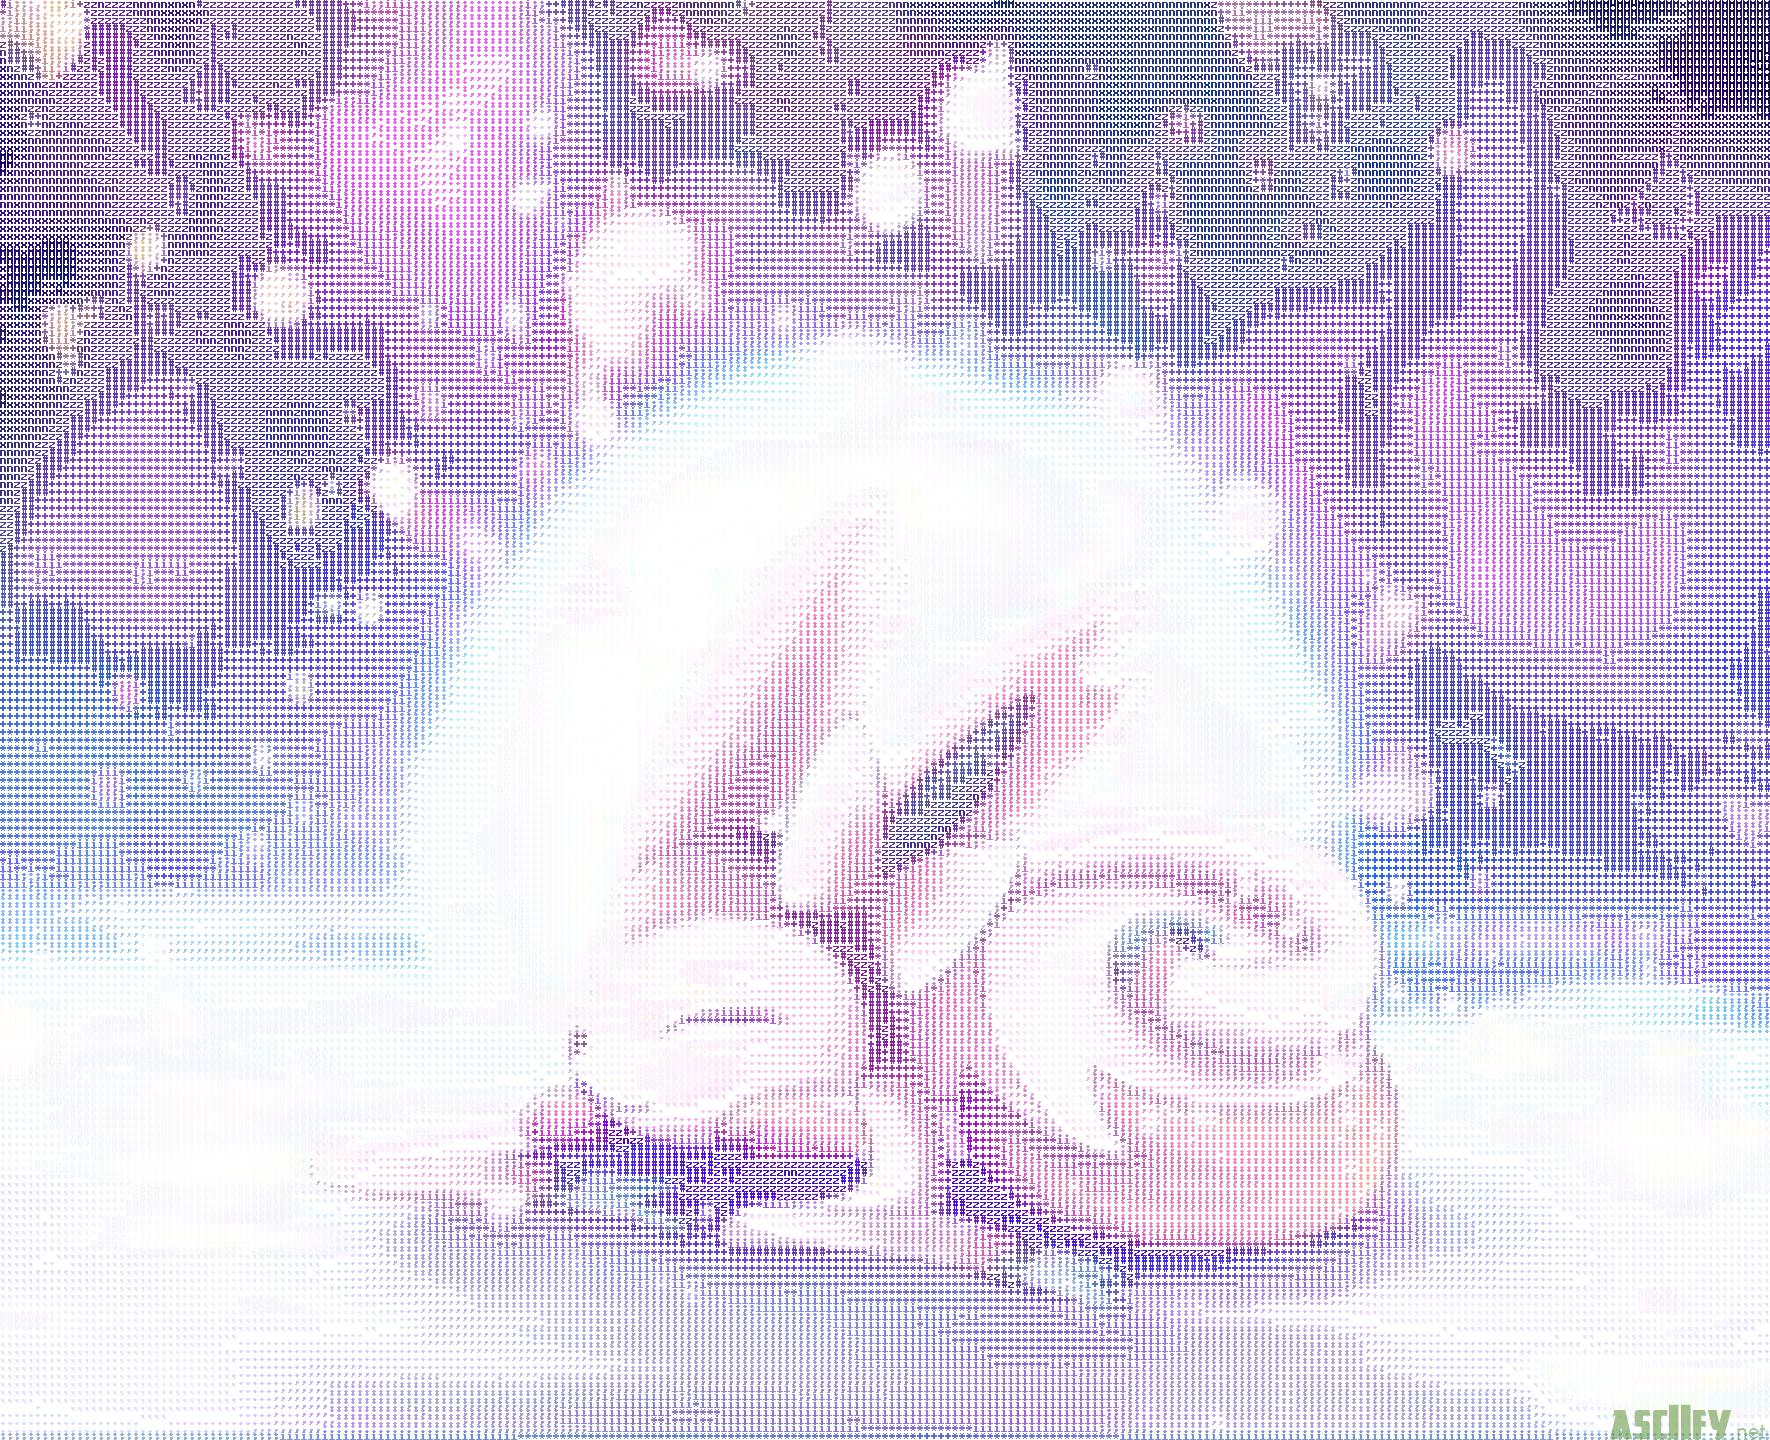 Sleeping sylveon